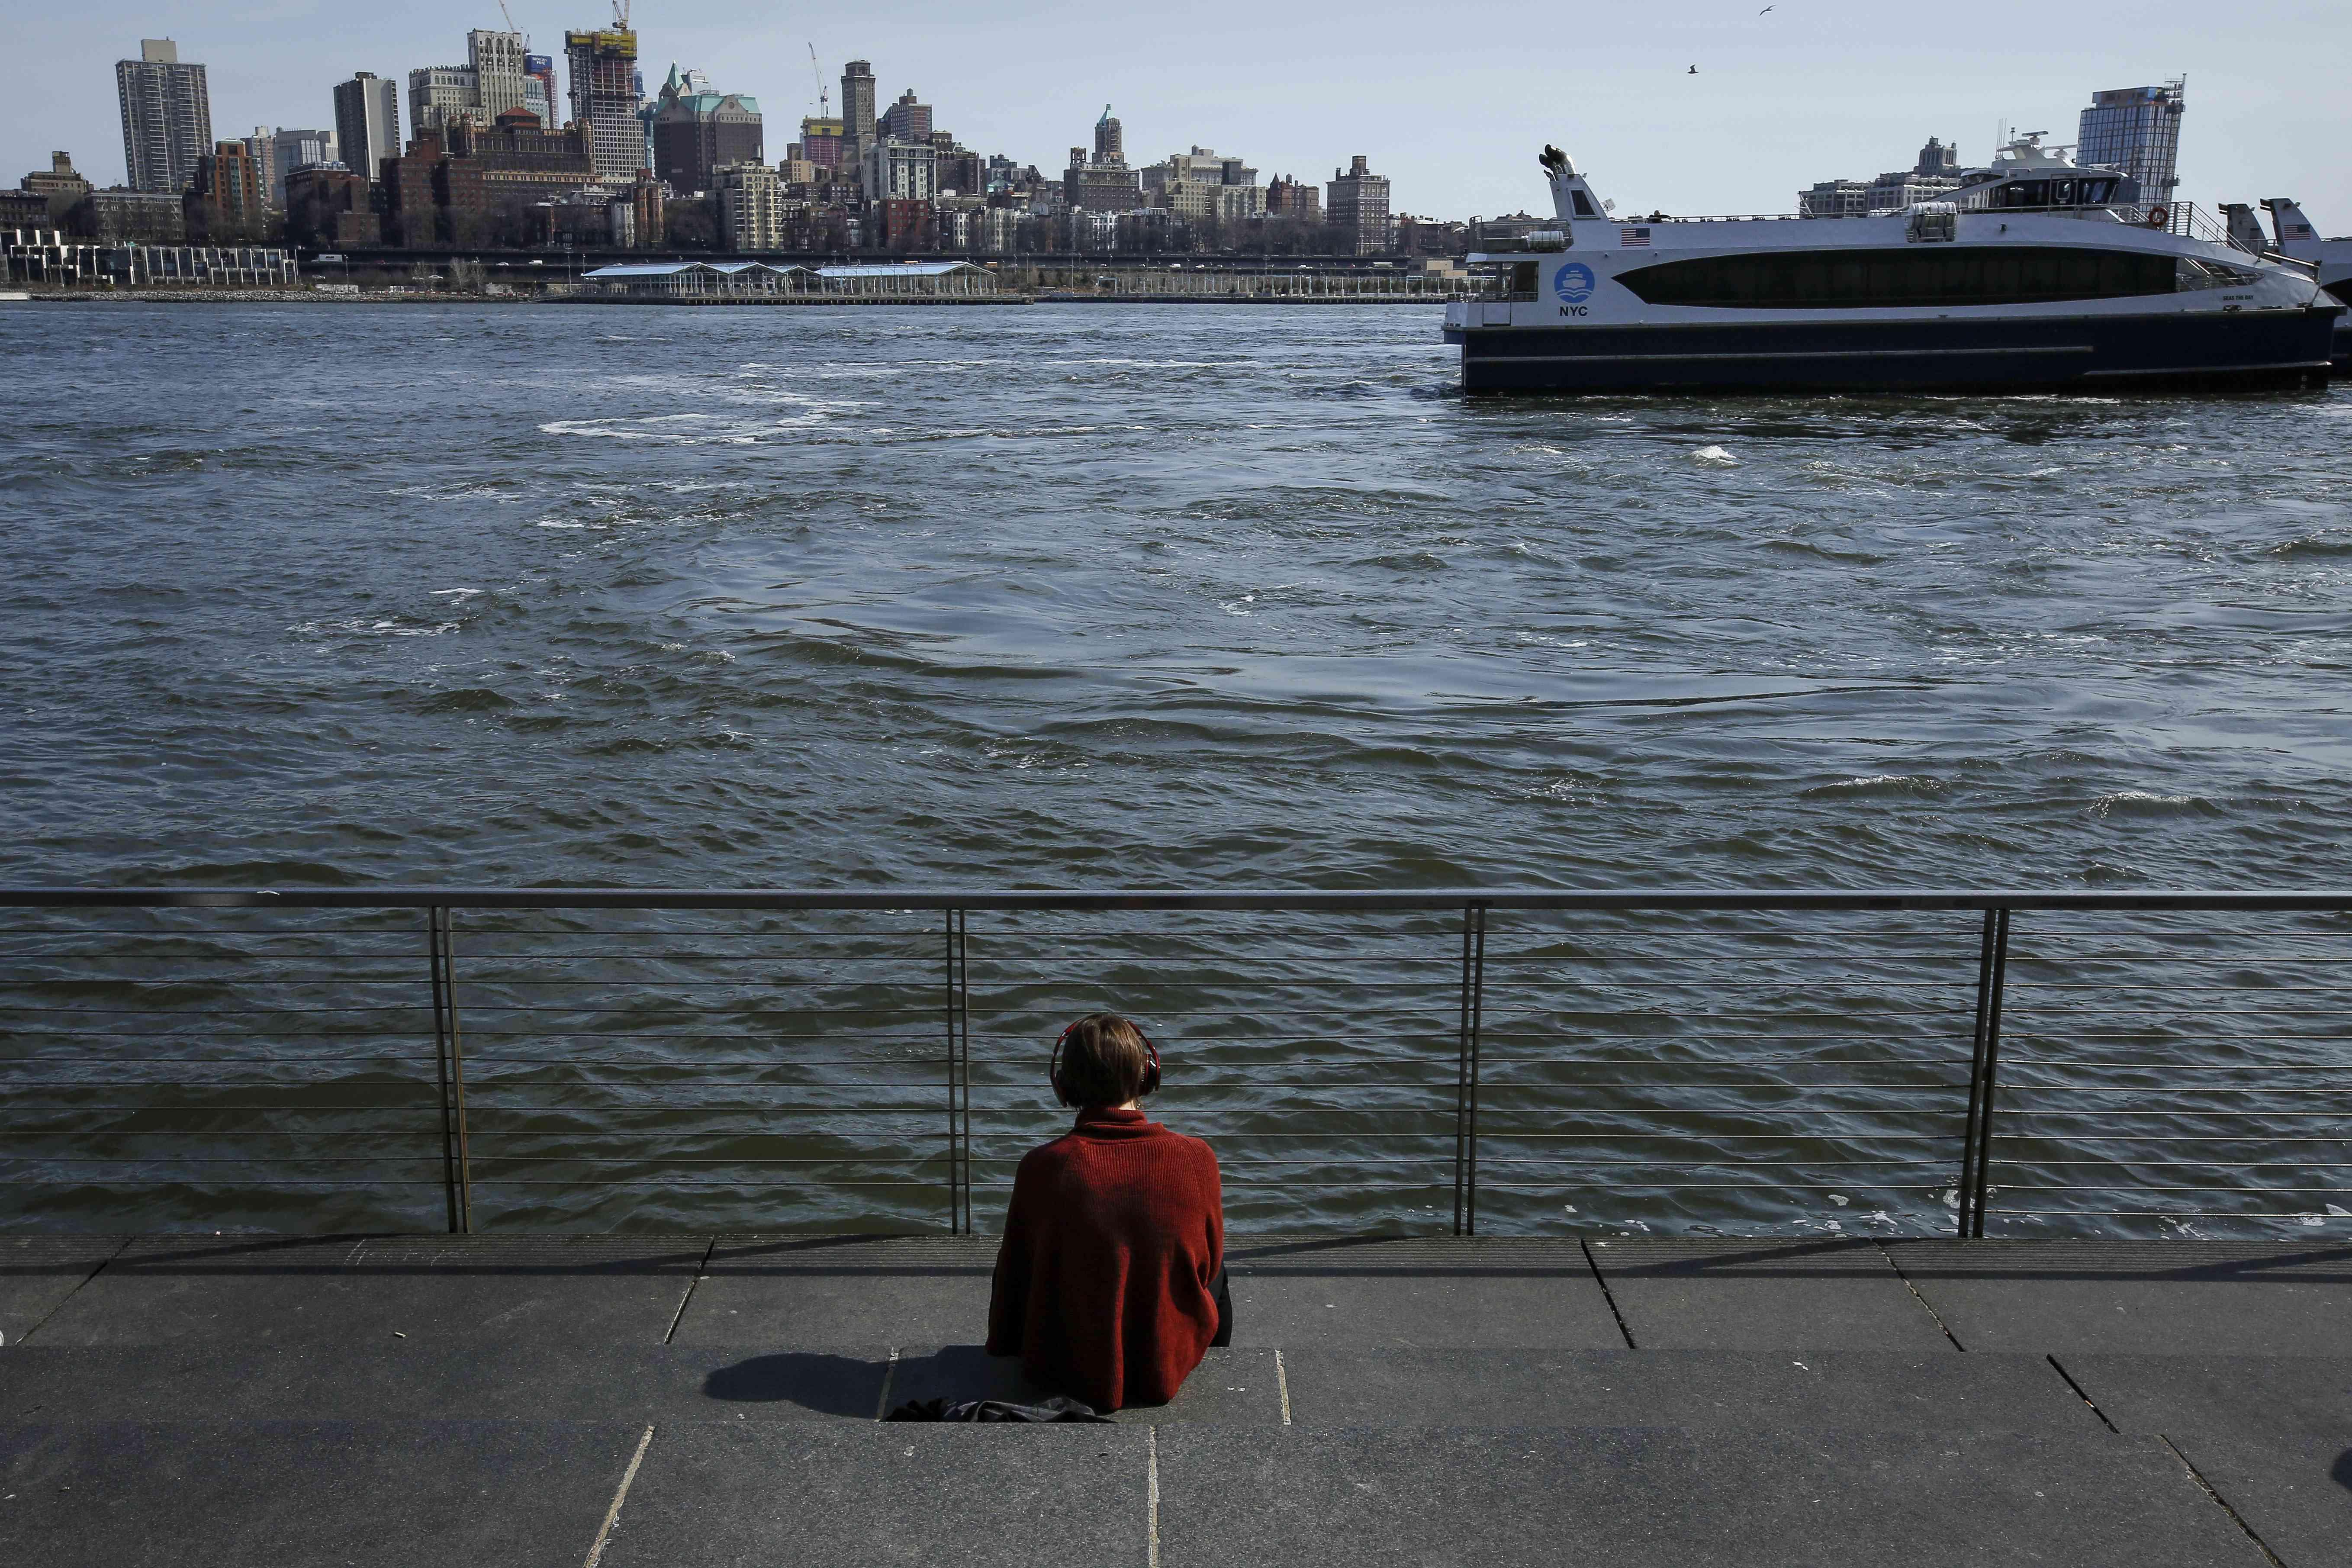 South Street Seaport looking towards Brooklyn Heights